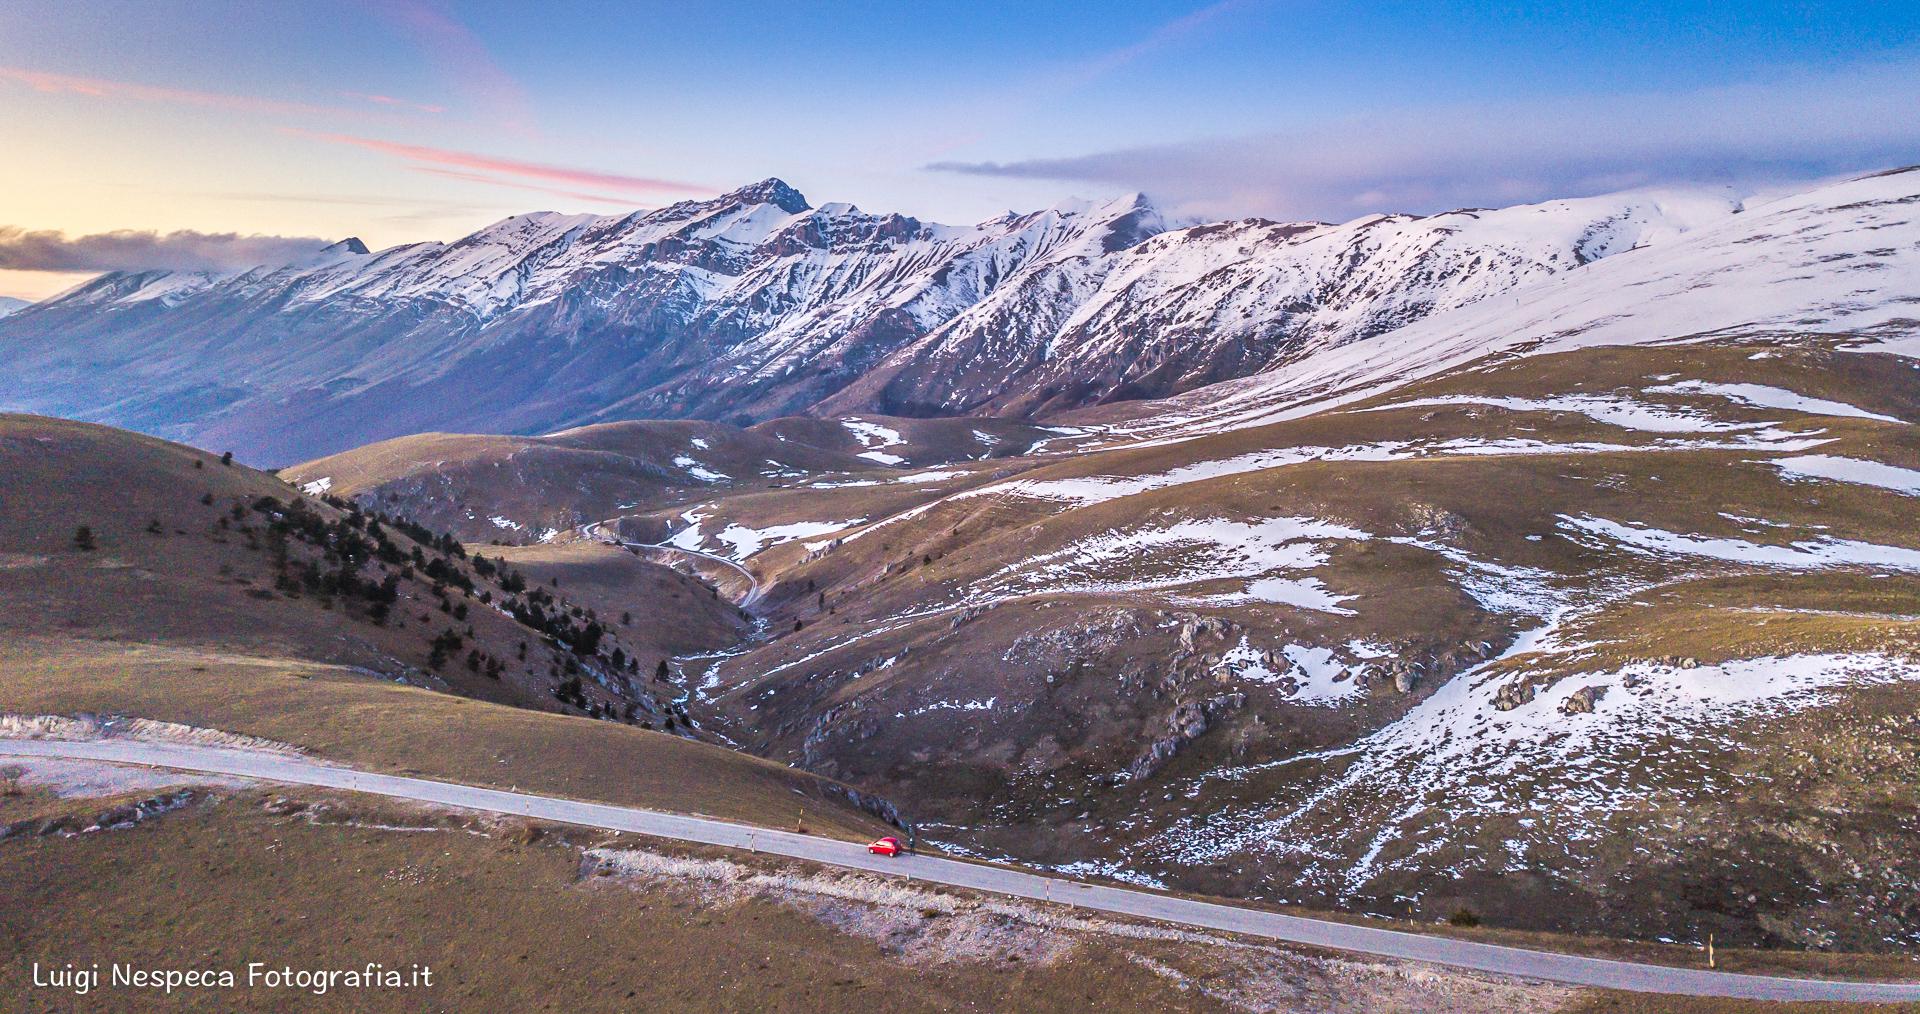 Prime nevi al Gran Sasso - Pizzo Cefalone -Assergi (AQ)